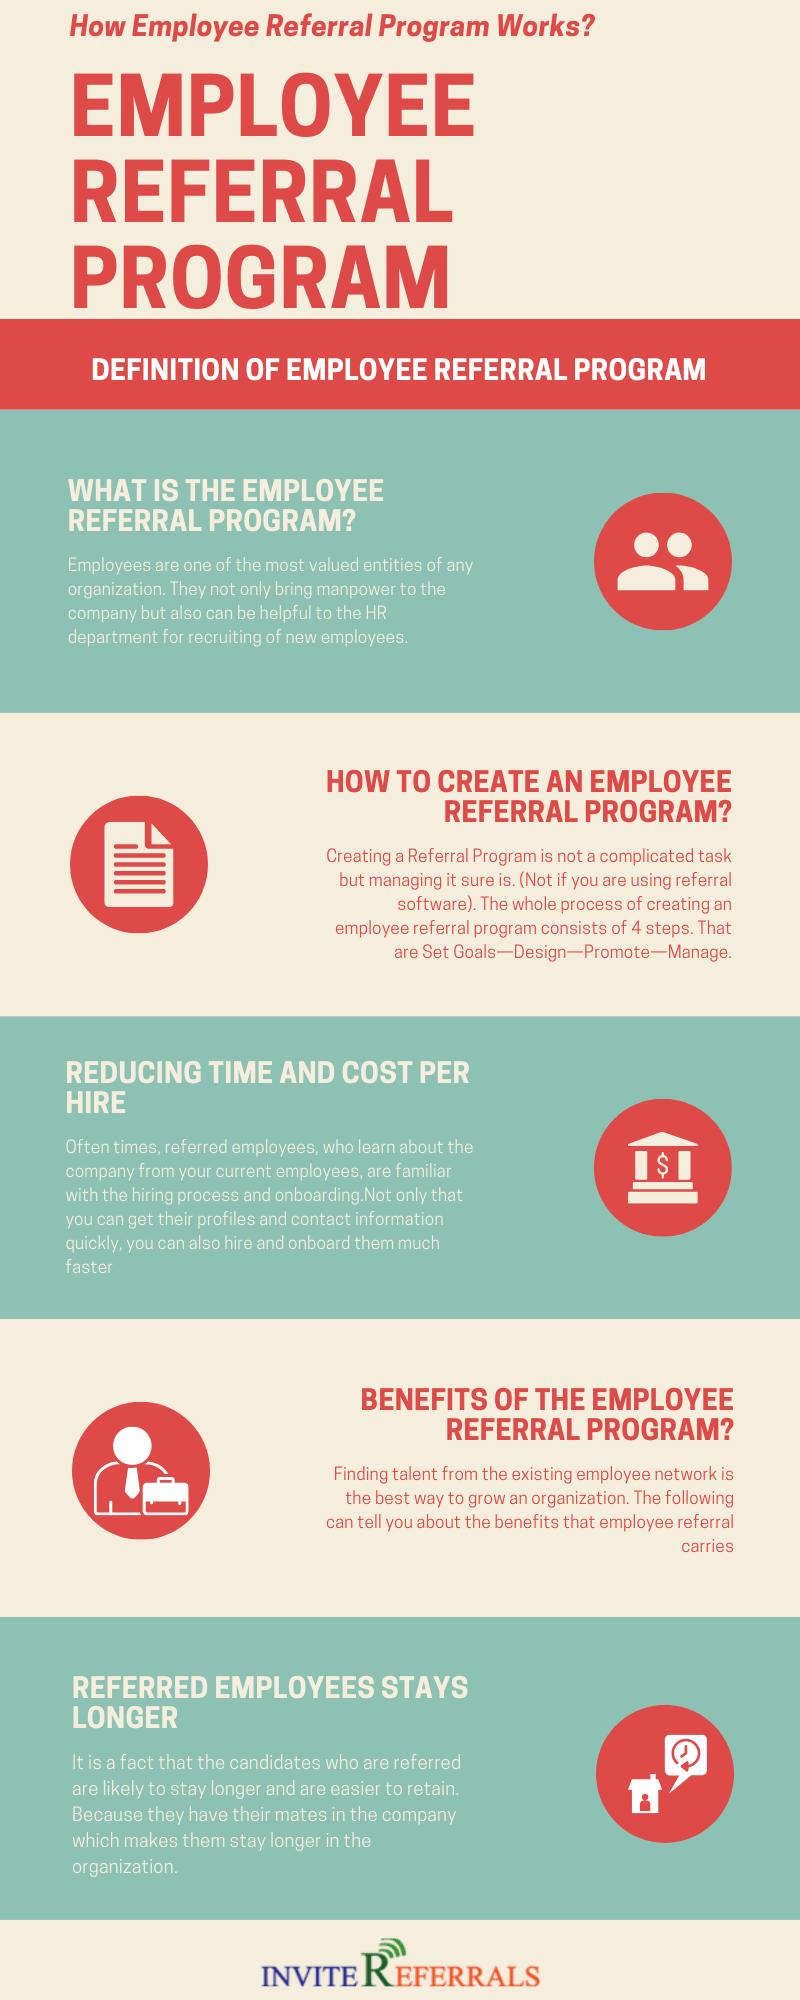 Employee Referral Program infographic